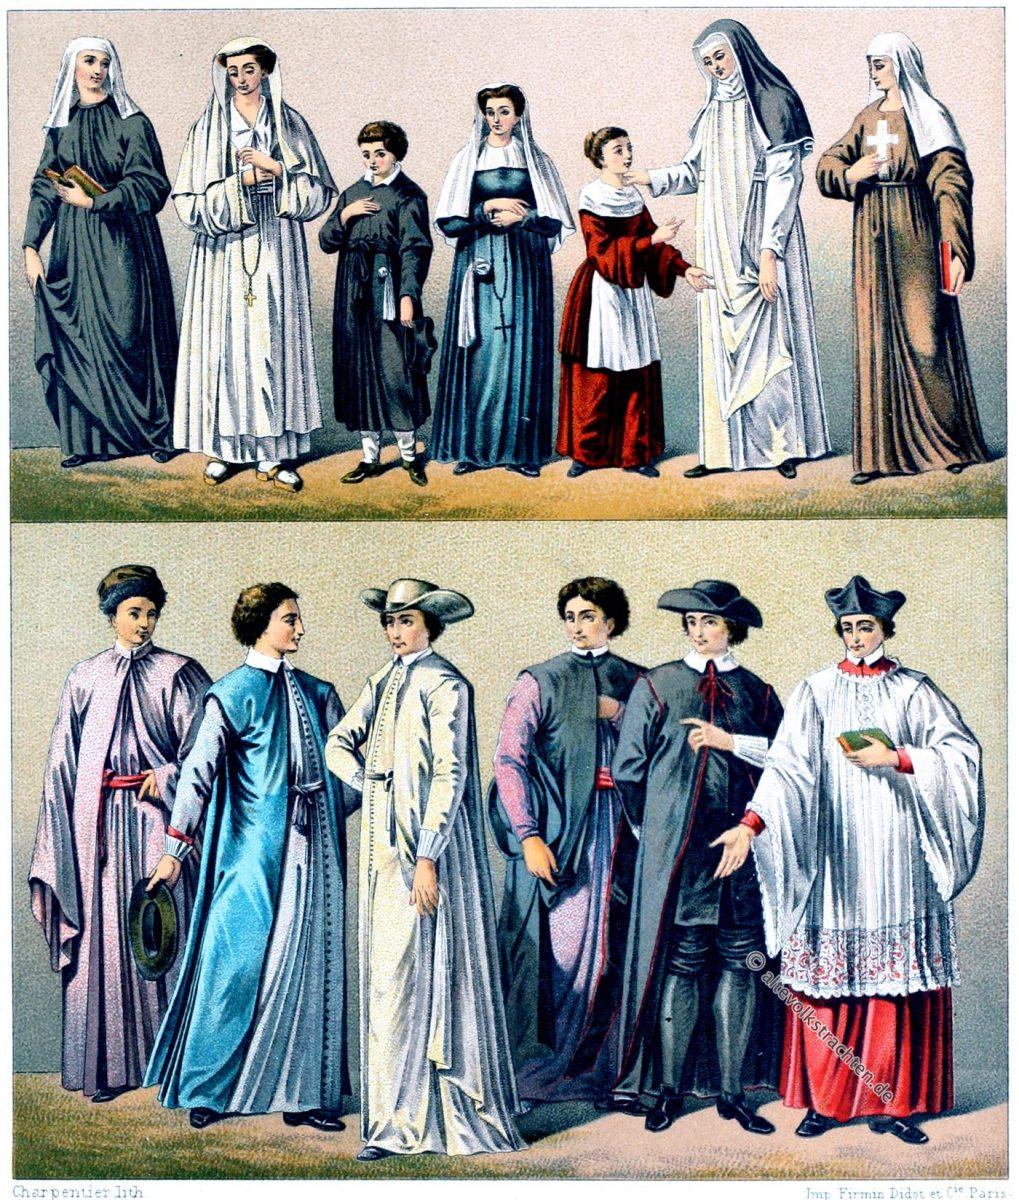 Ursulinen, Nonnen, religiöse Trachten, Ordensgewand, Auguste Racinet